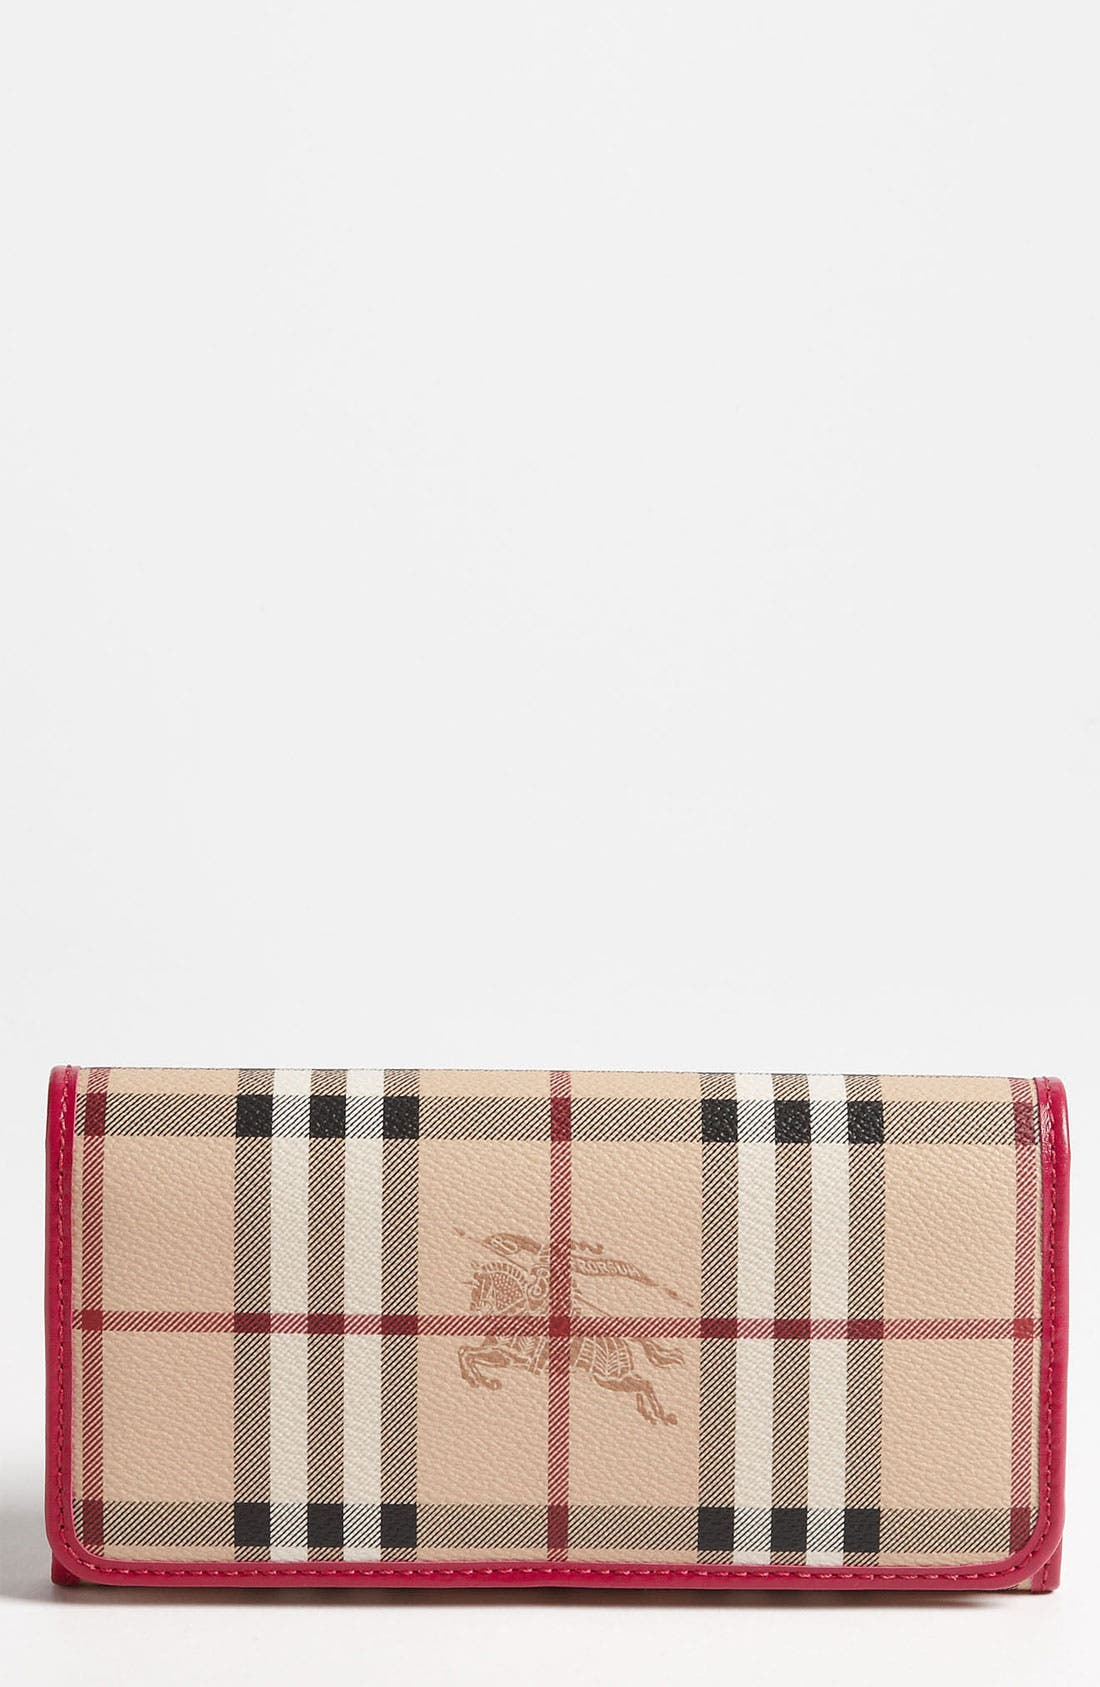 Main Image - Burberry 'Haymarket Check' Flap Wallet